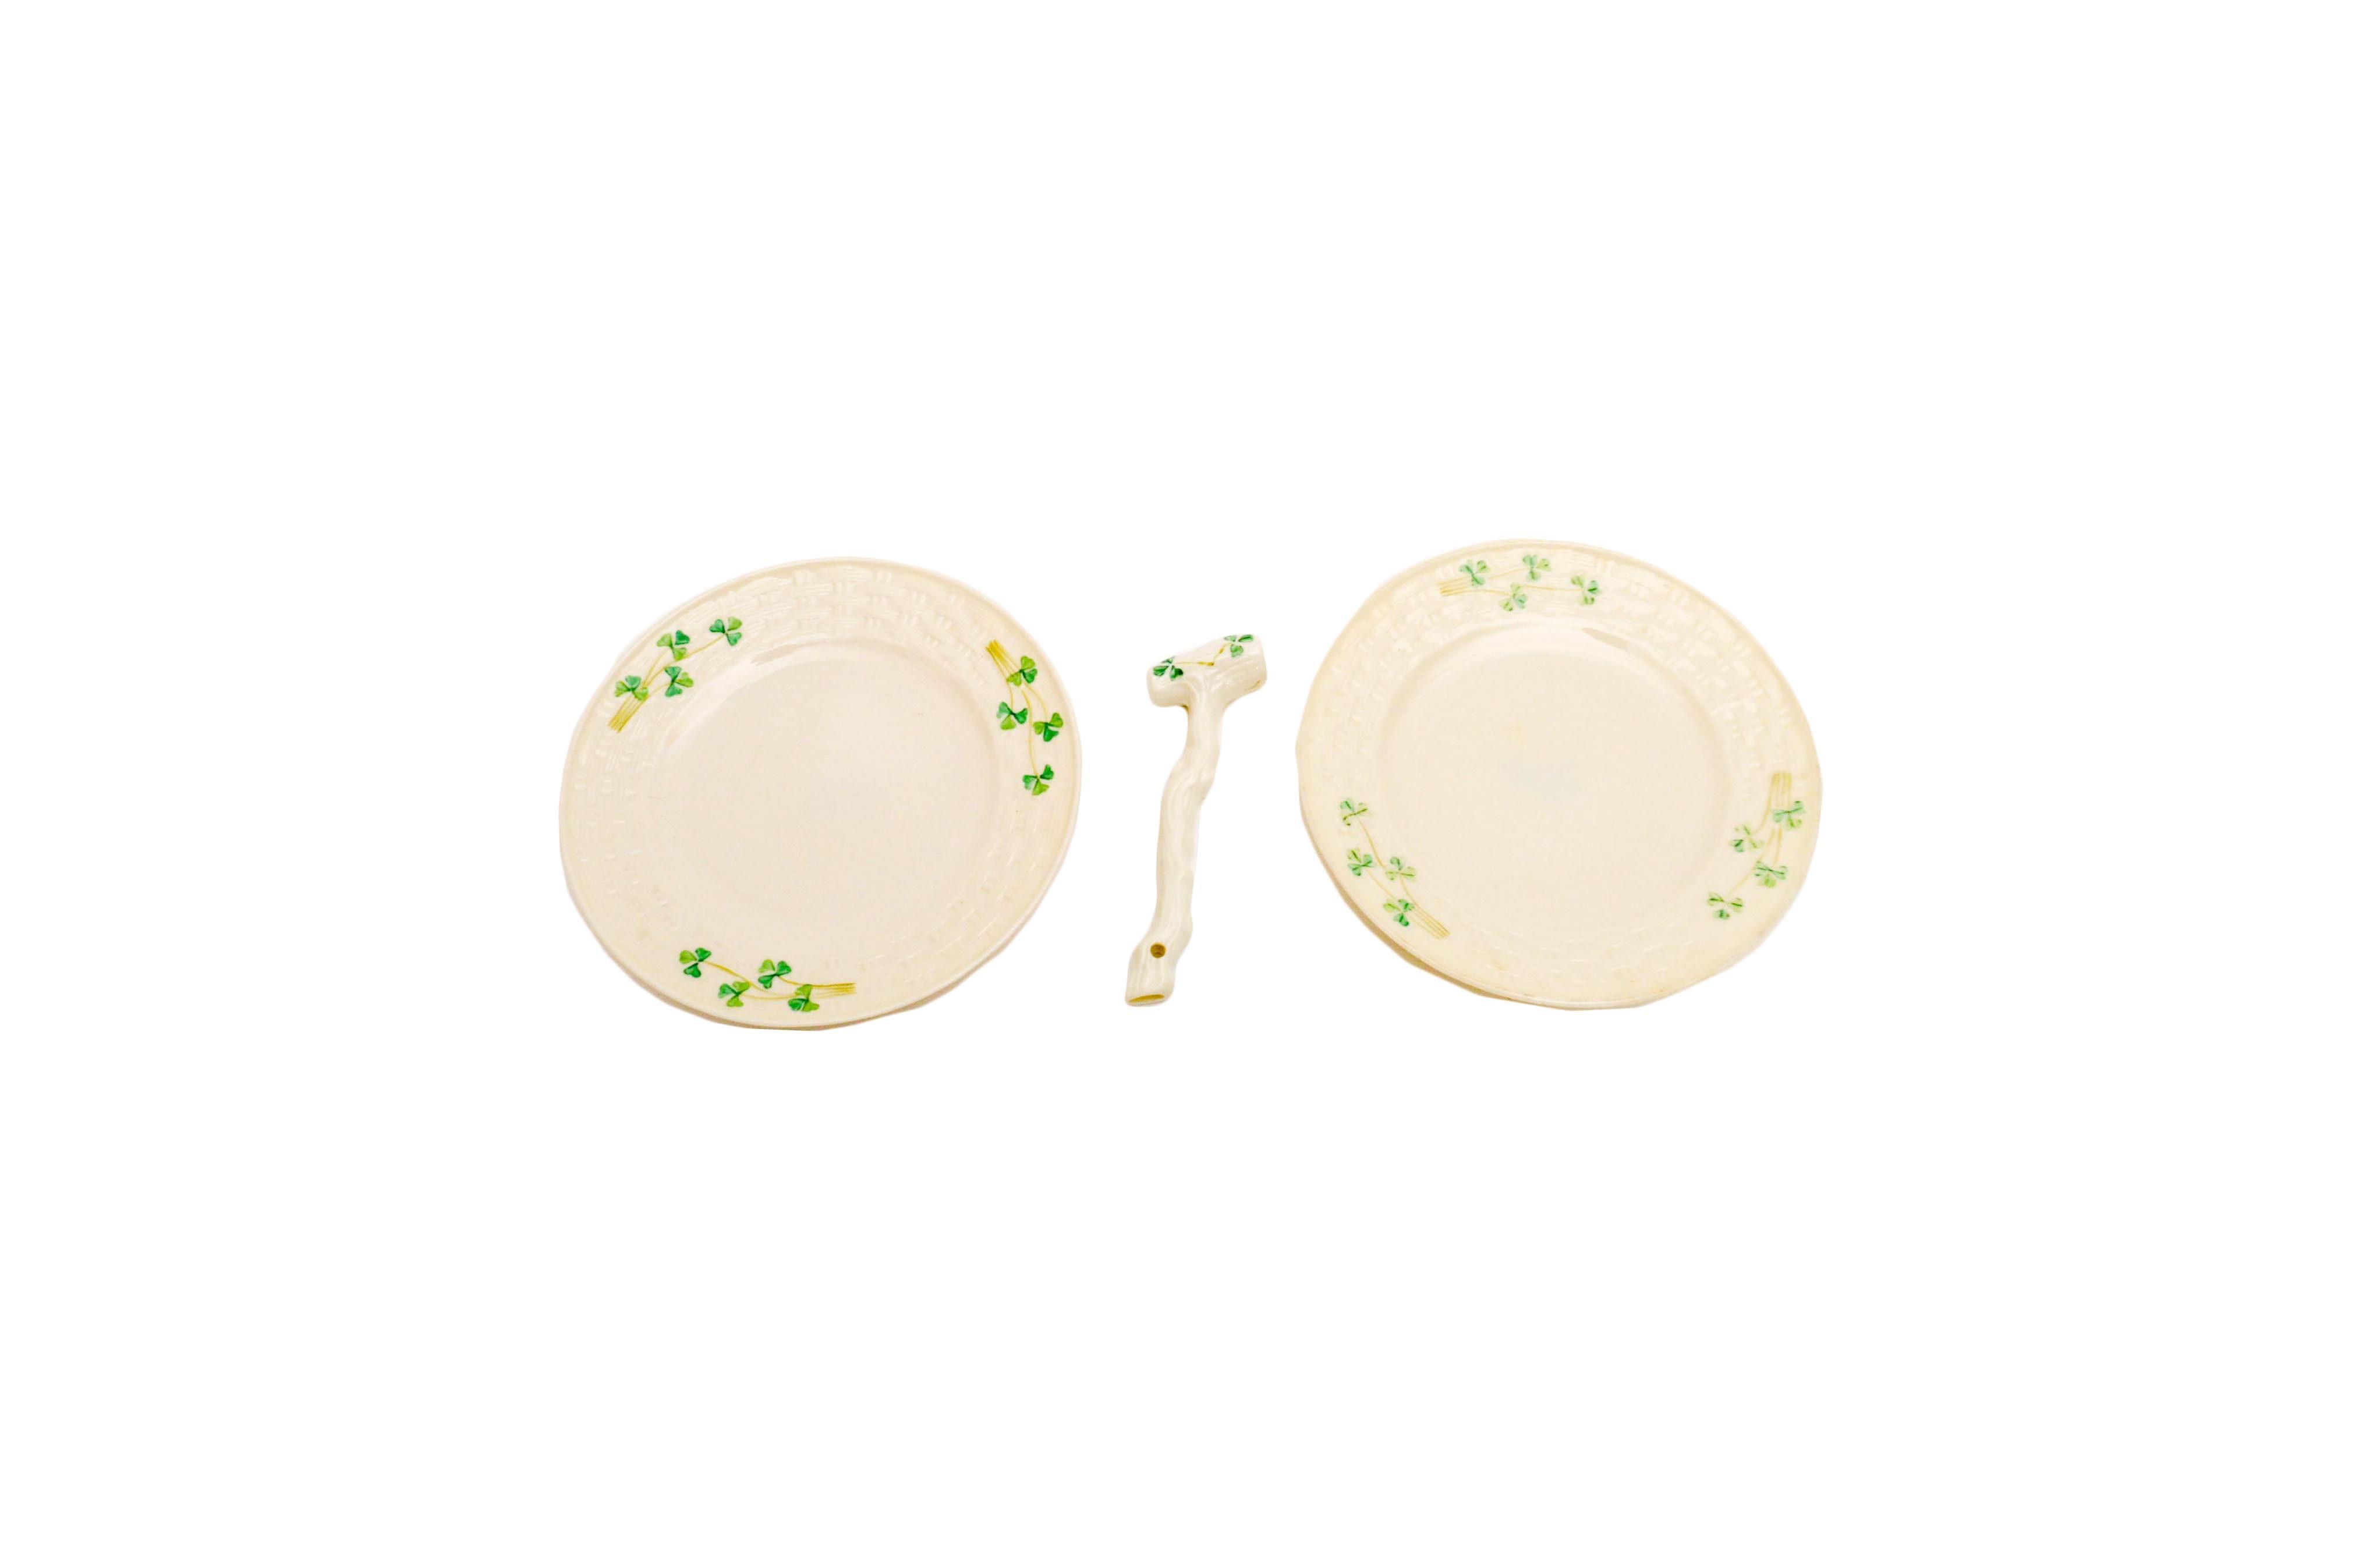 Belleek Salad Plates and Cane Ornament